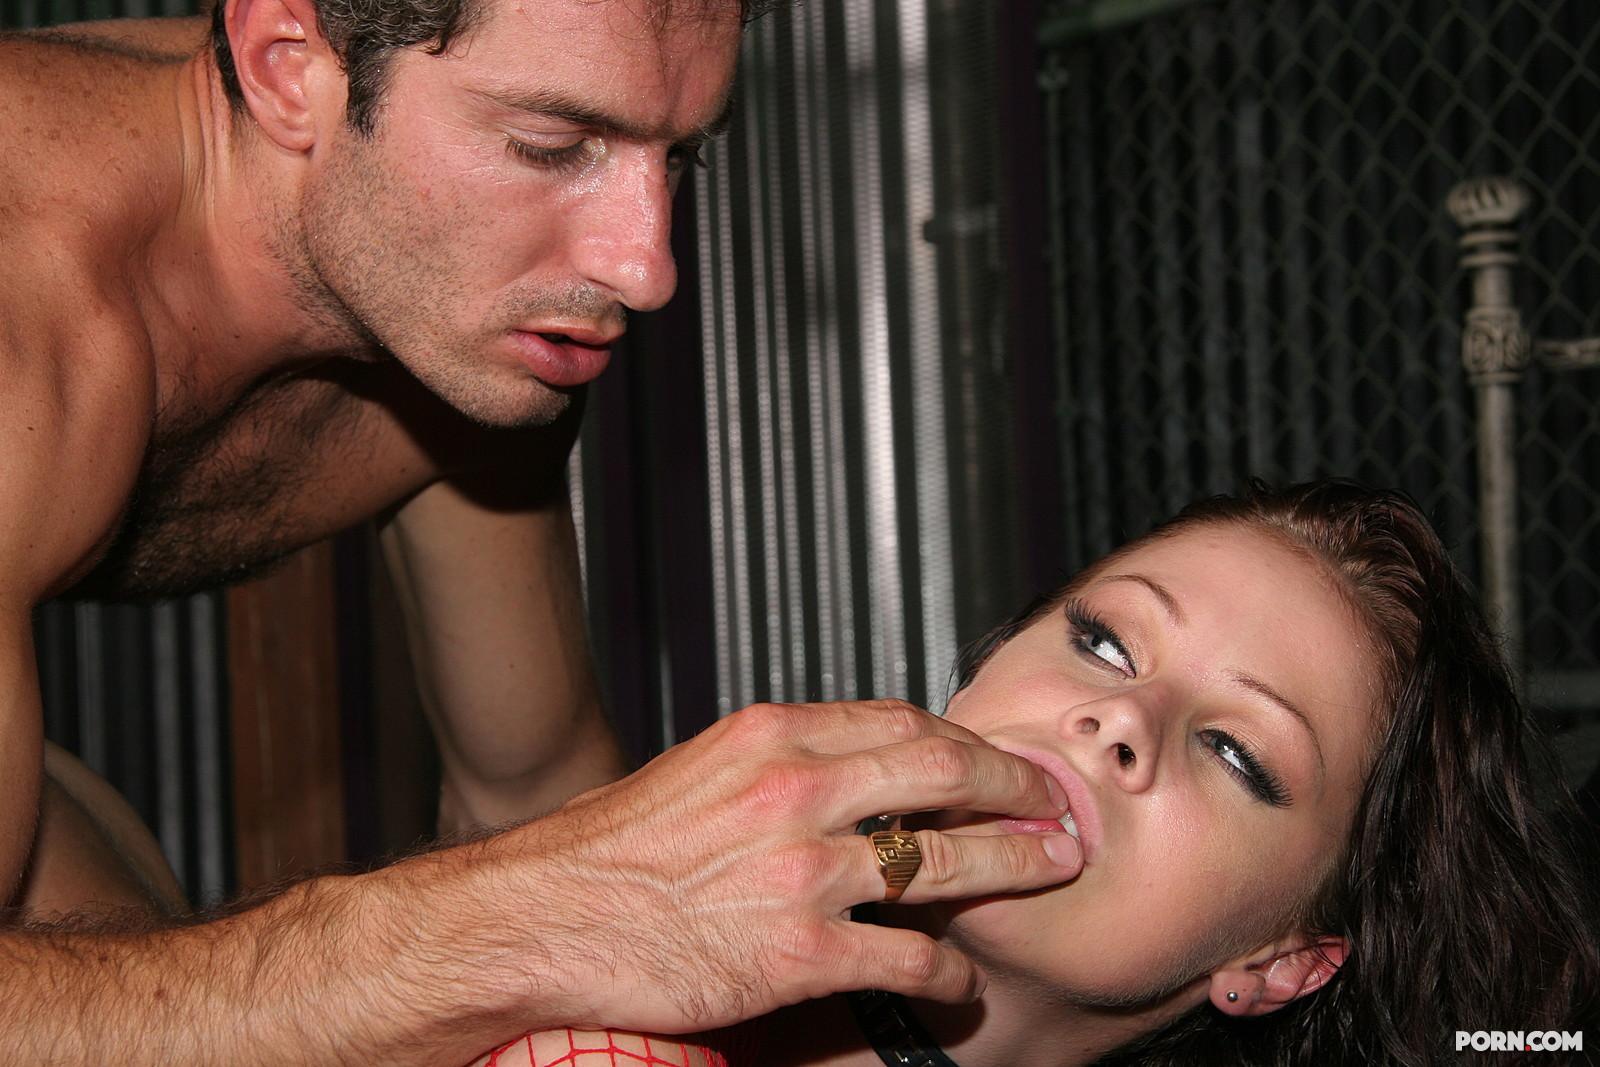 Рабыни ублажают хозяина порно онлайн 18 фотография